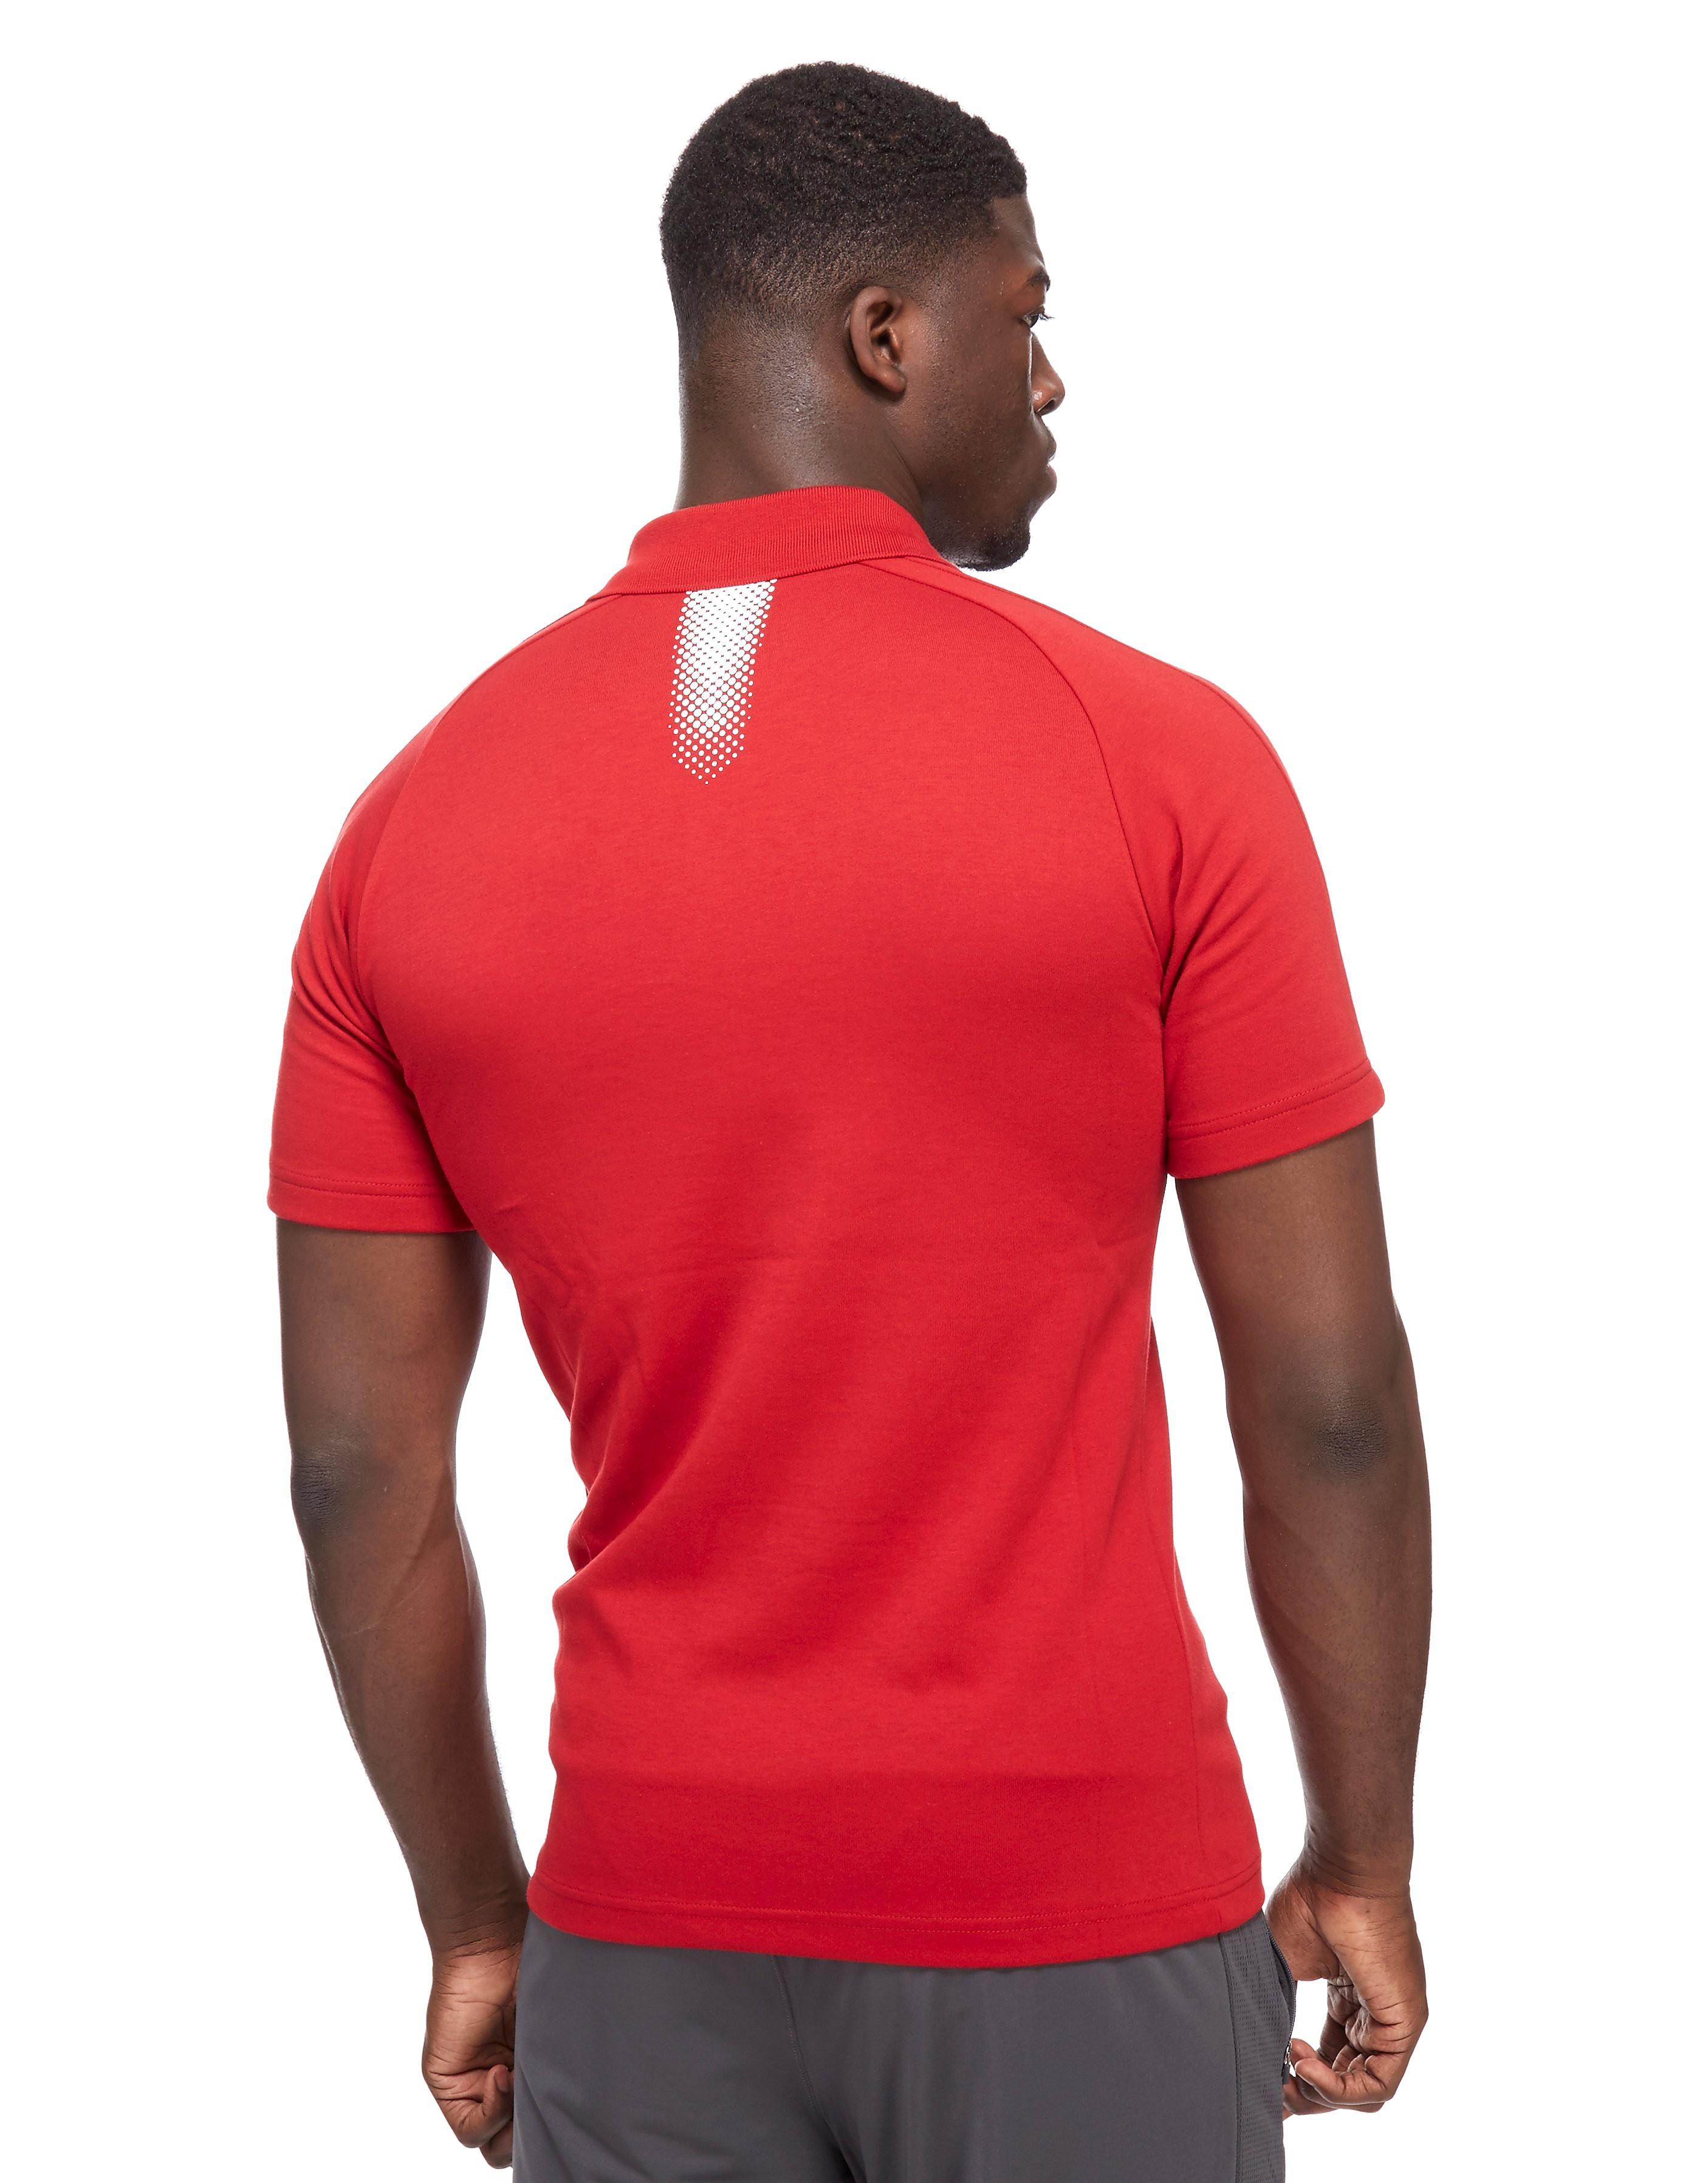 PUMA Arsenal FC 2017 Casual Performance Polo Shirt